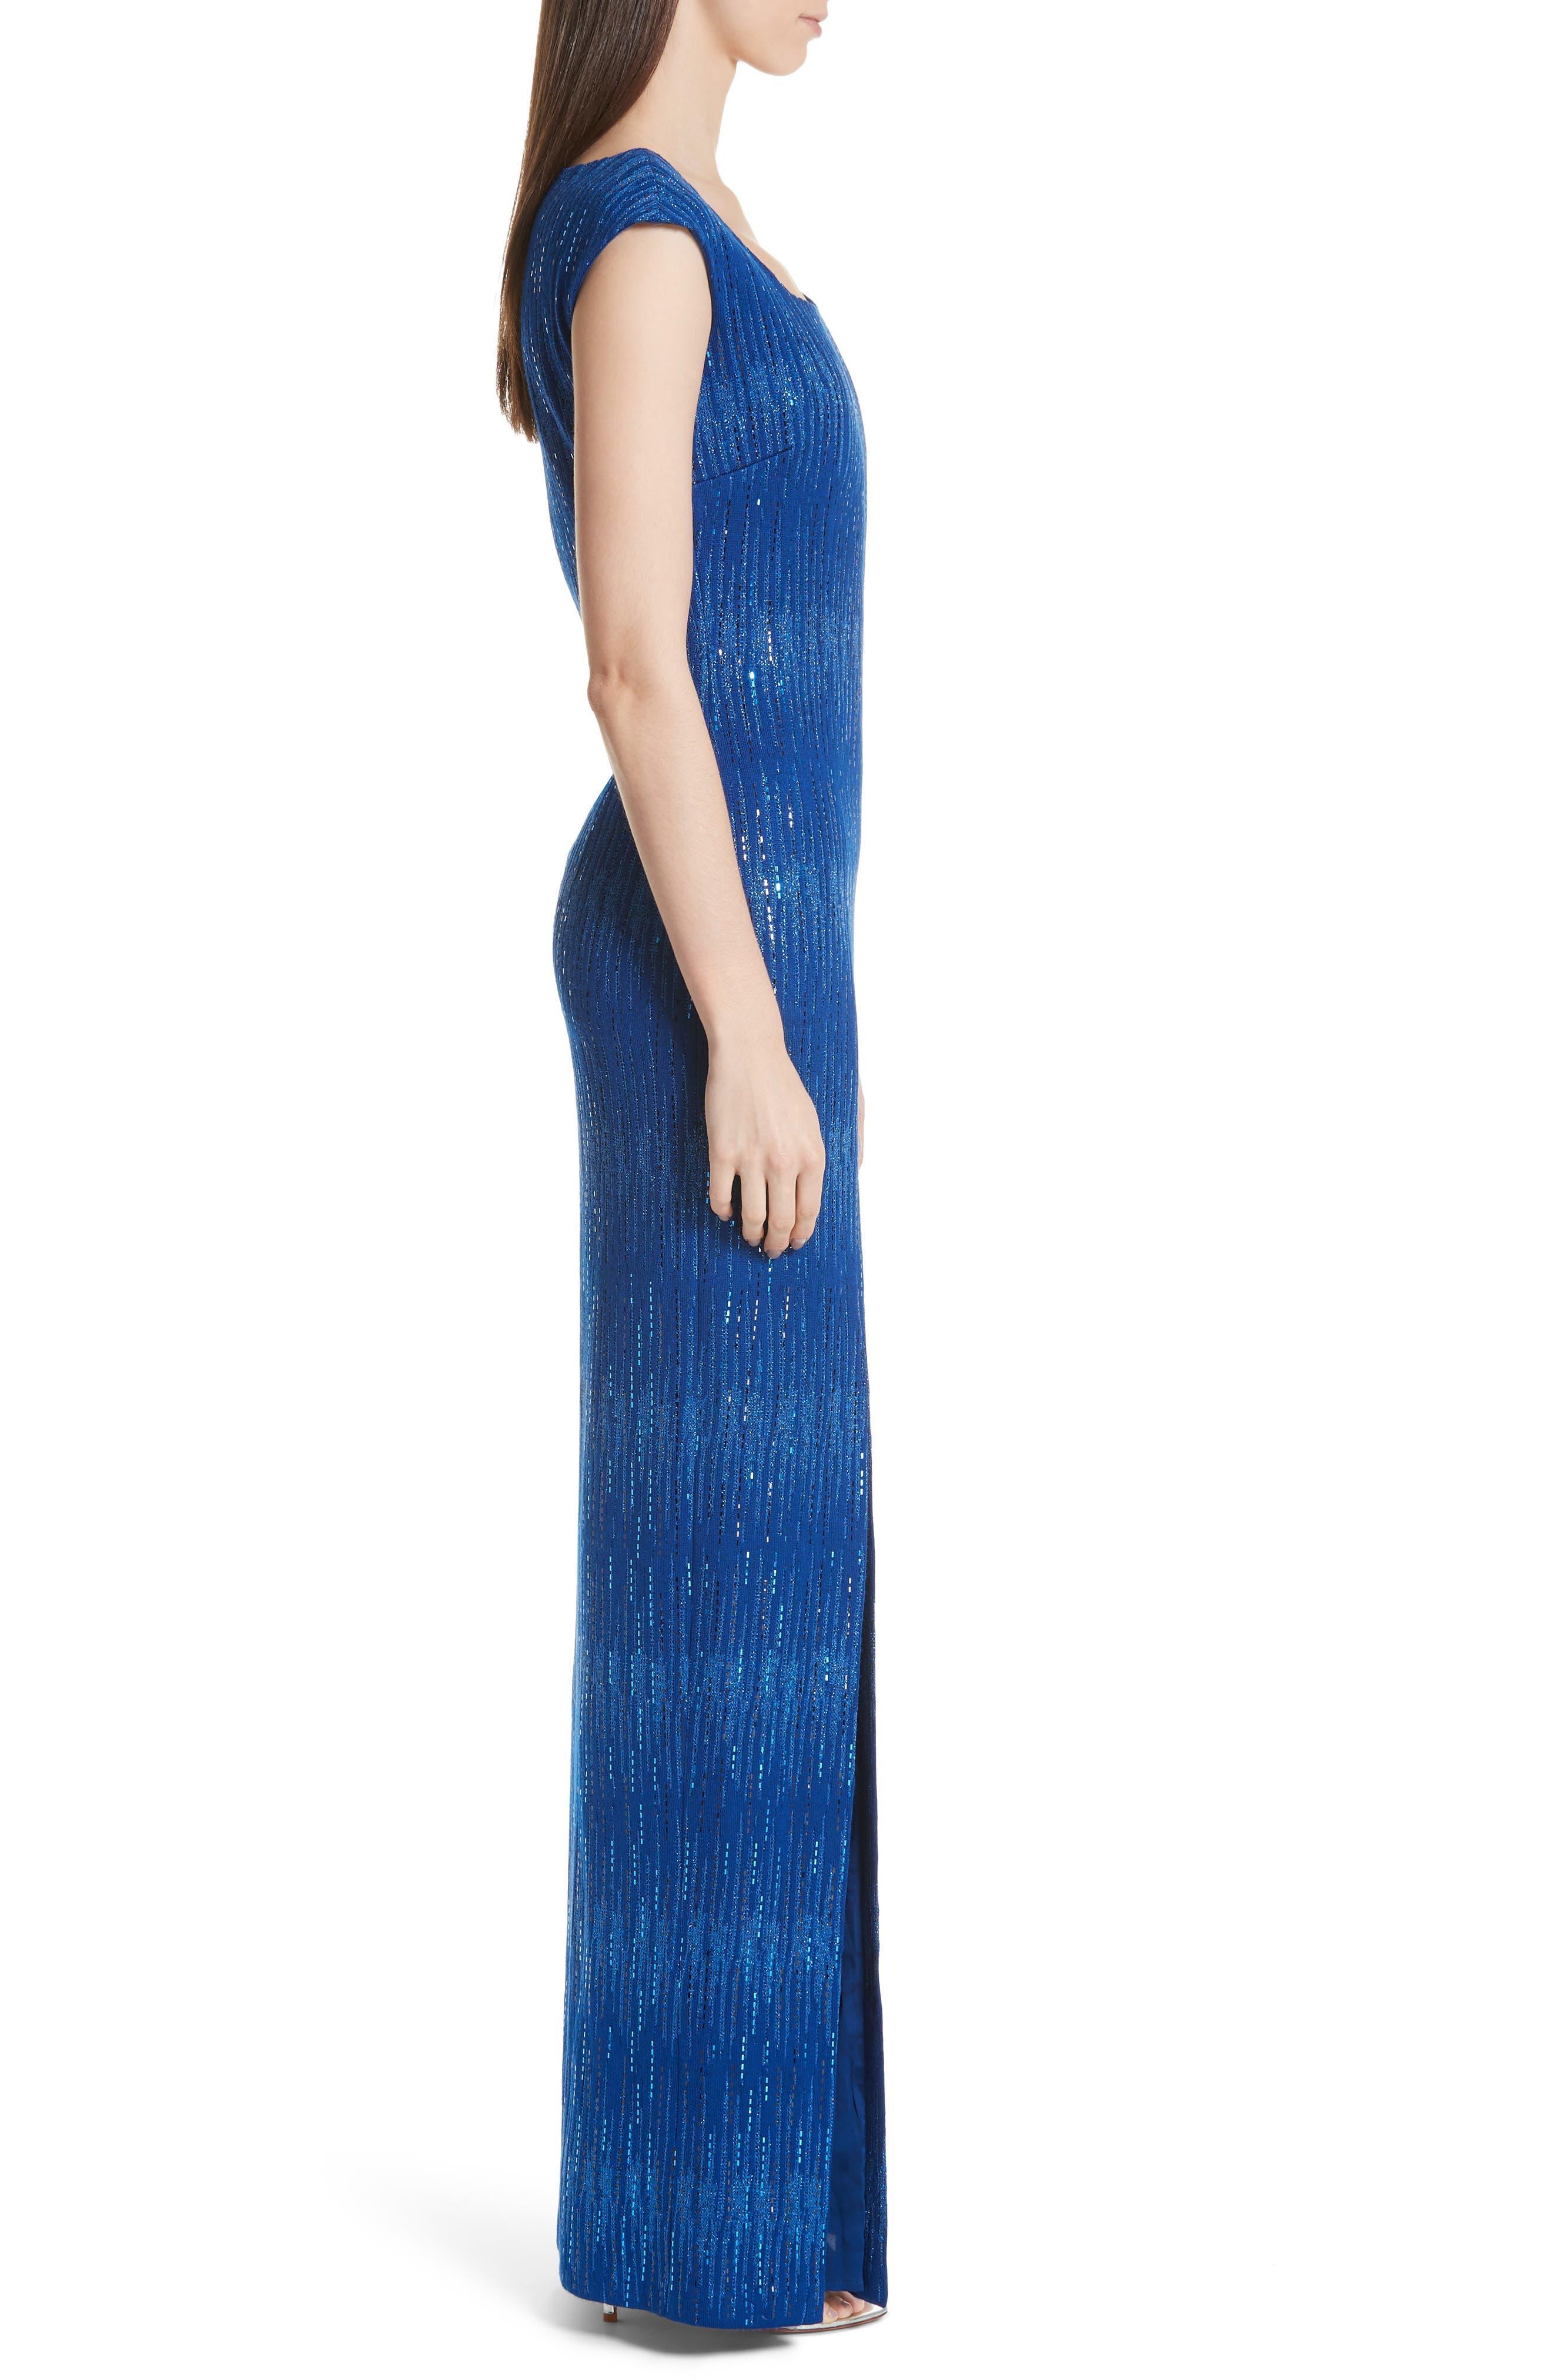 ST. JOHN COLLECTION, Asymmetrical Neck Carrie Knit Evening Dress, Alternate thumbnail 3, color, AZUL